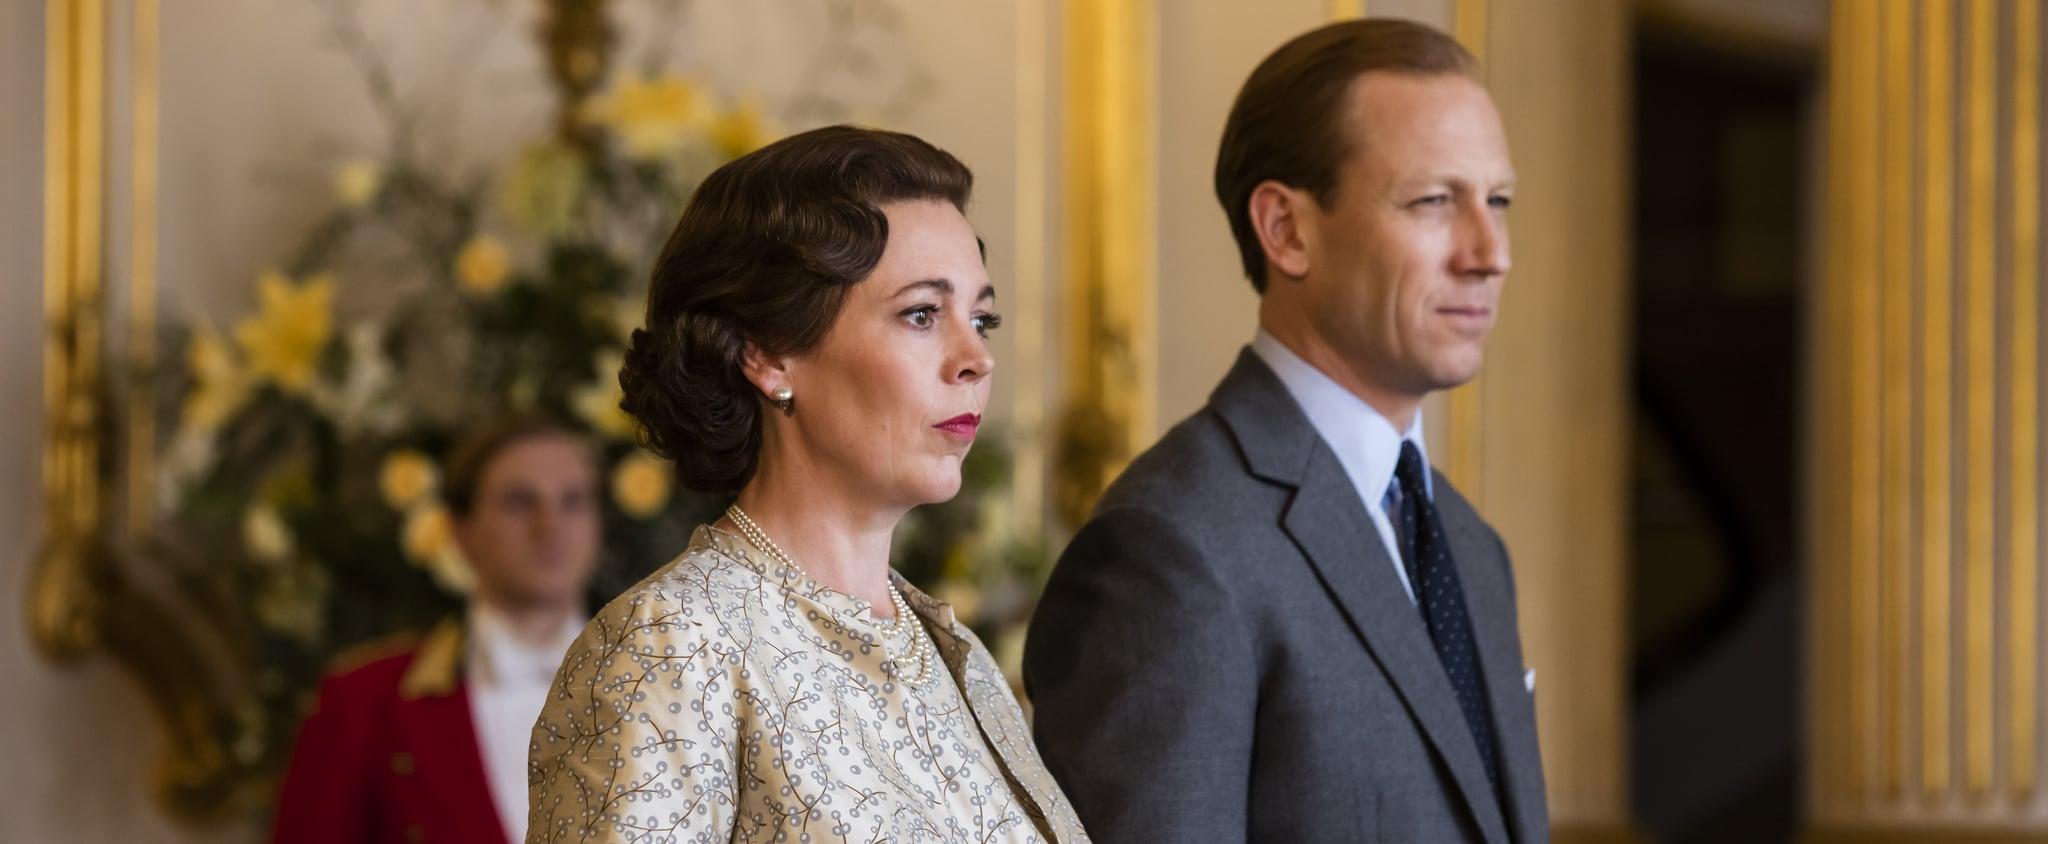 When Will The Crown Season 3 Premiere on Netflix?